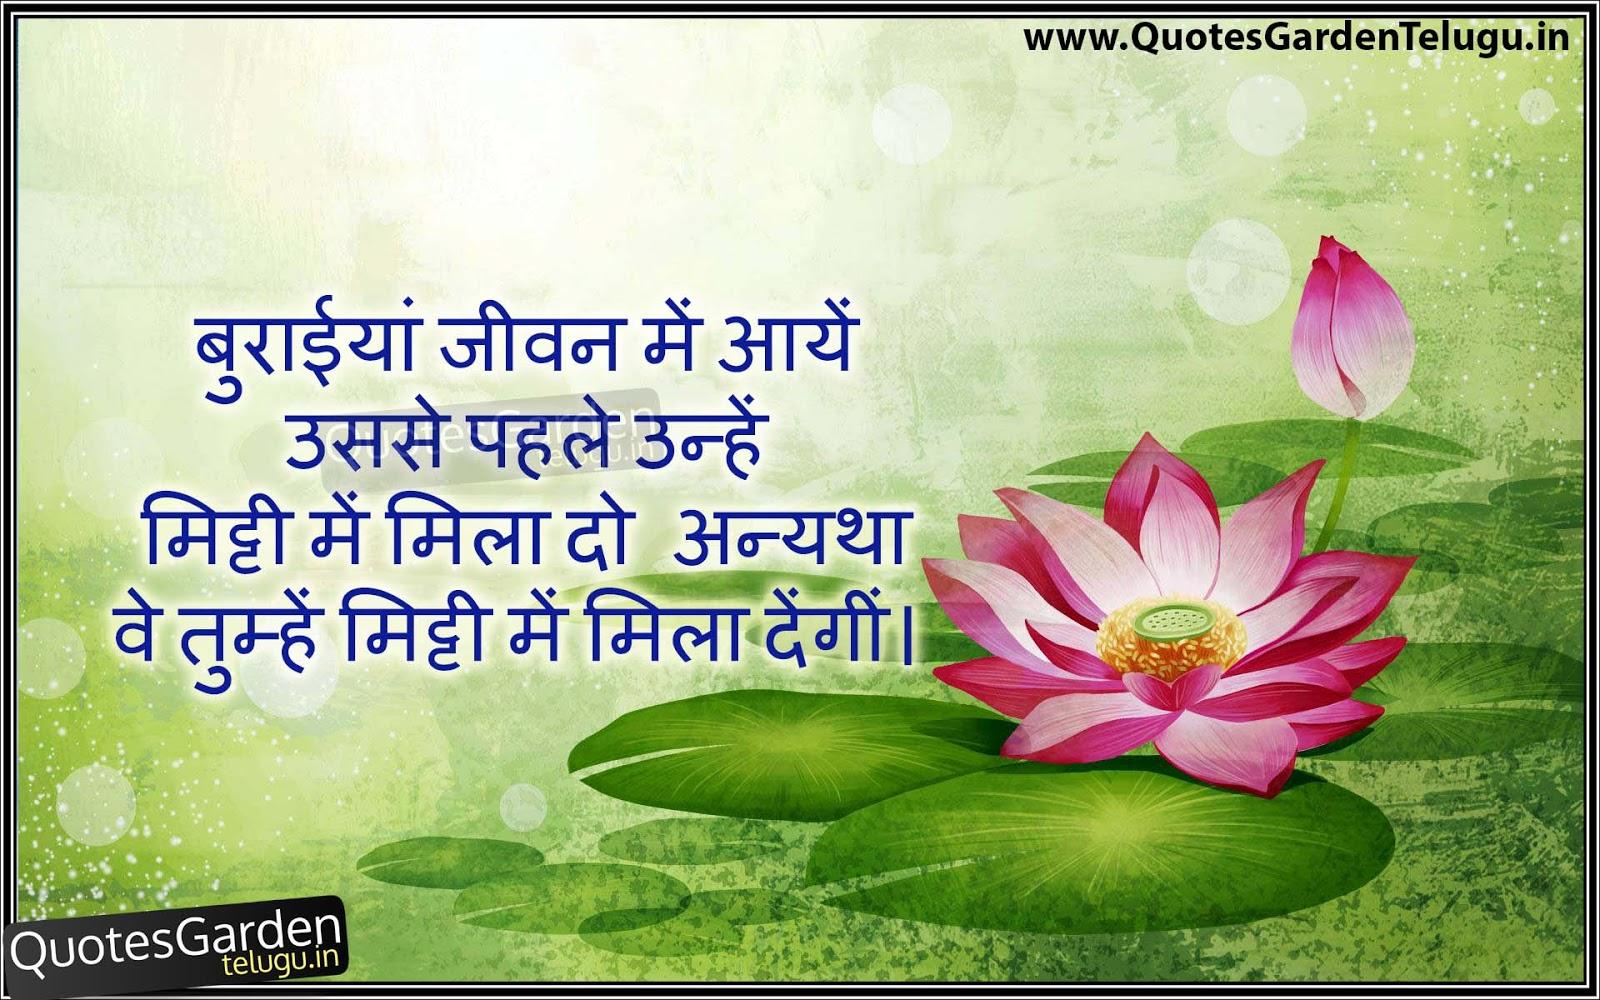 Hindi Anmol Vachan Life Shayari